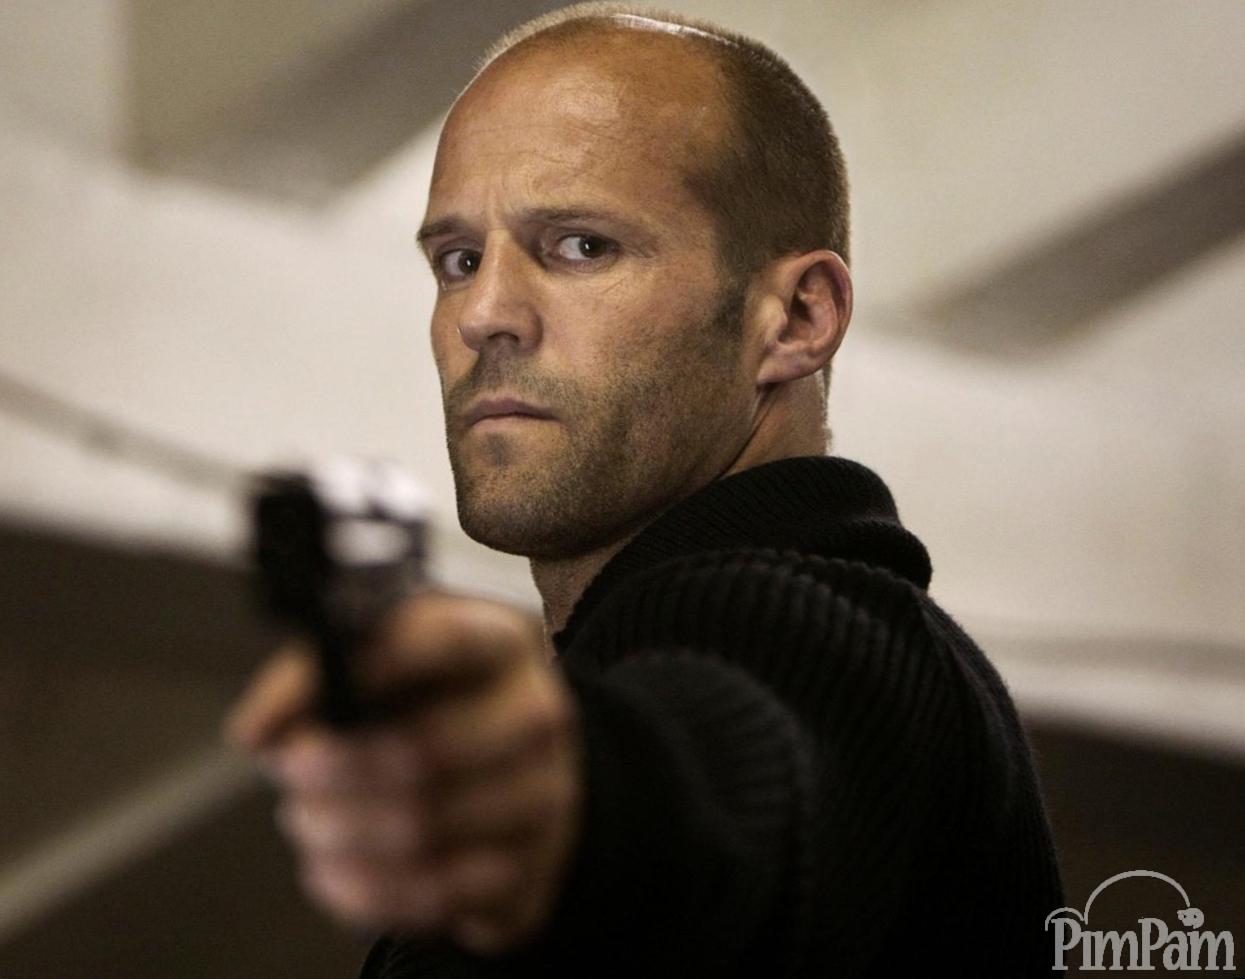 Джейсон Стетхем (Джейсон Стэтхэм, Jason Statham), все ...